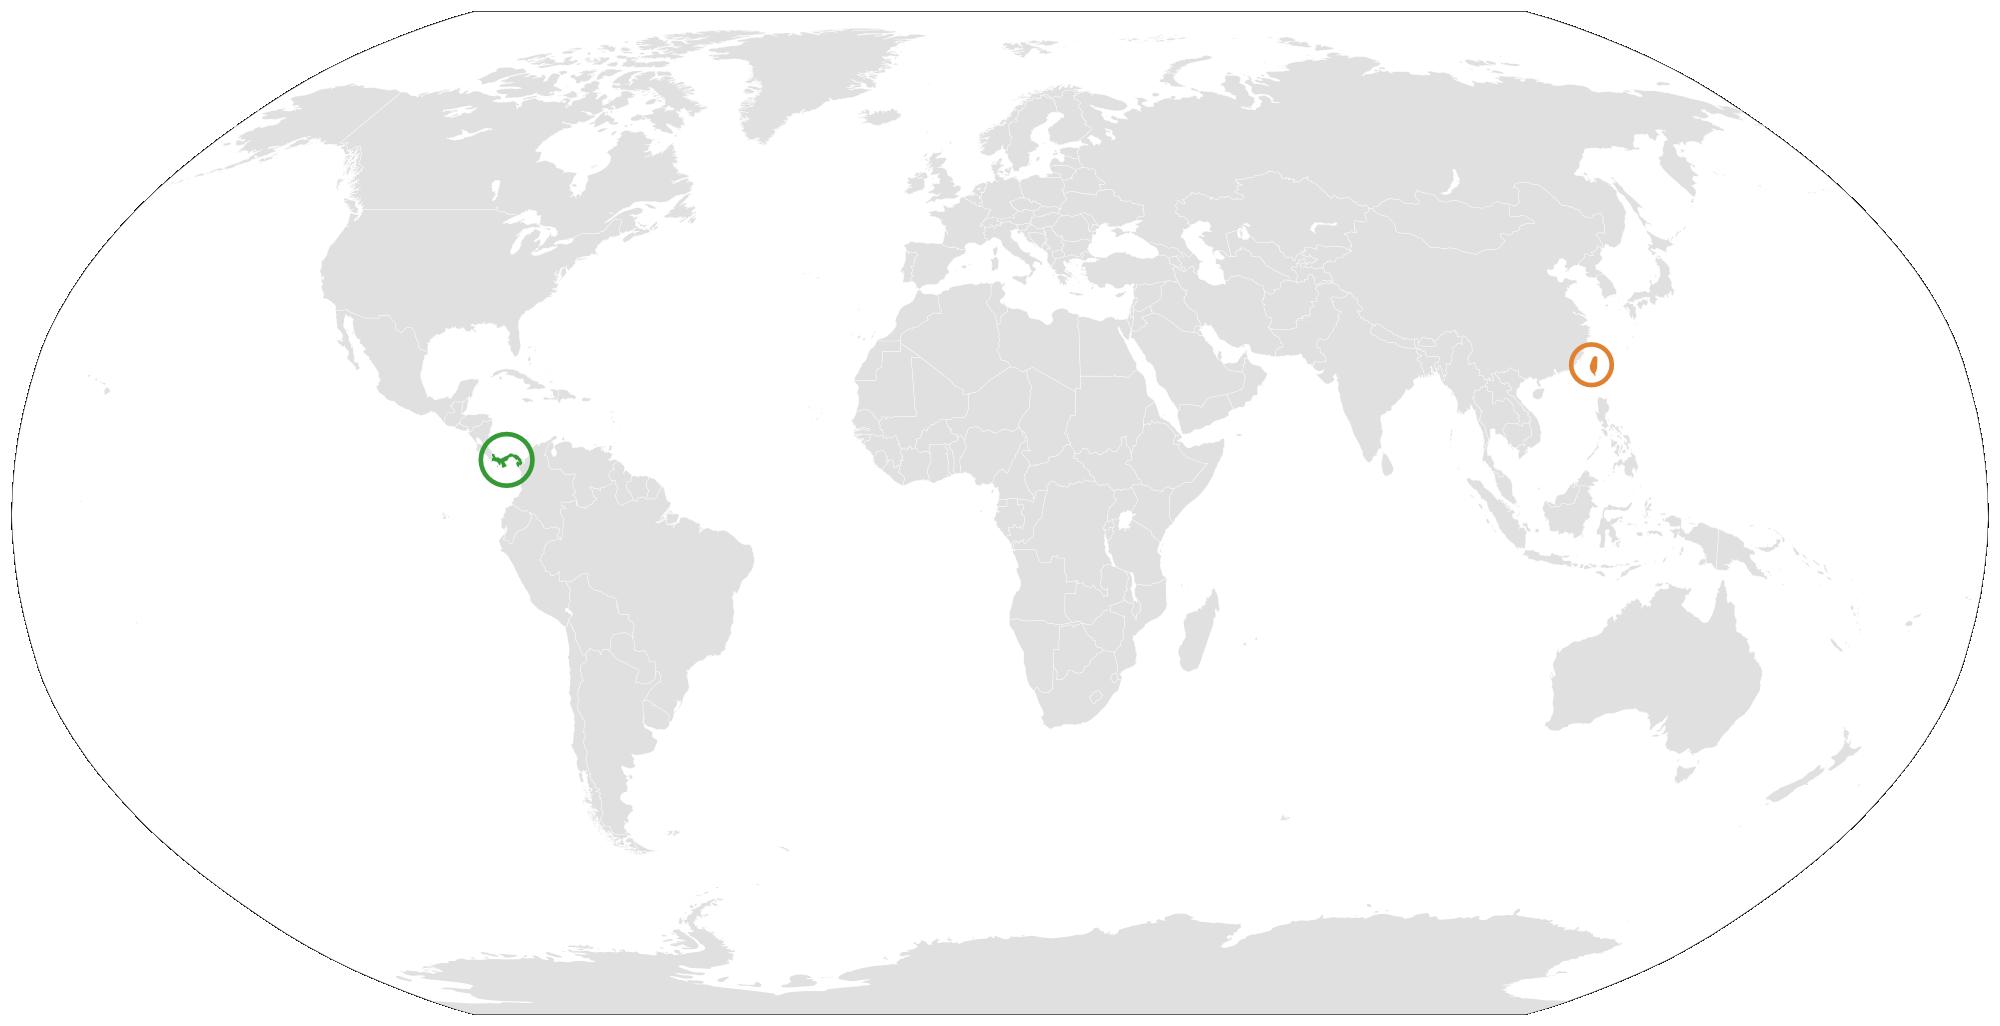 Filepanama republic of china locatorg wikimedia commons filepanama republic of china locatorg gumiabroncs Image collections